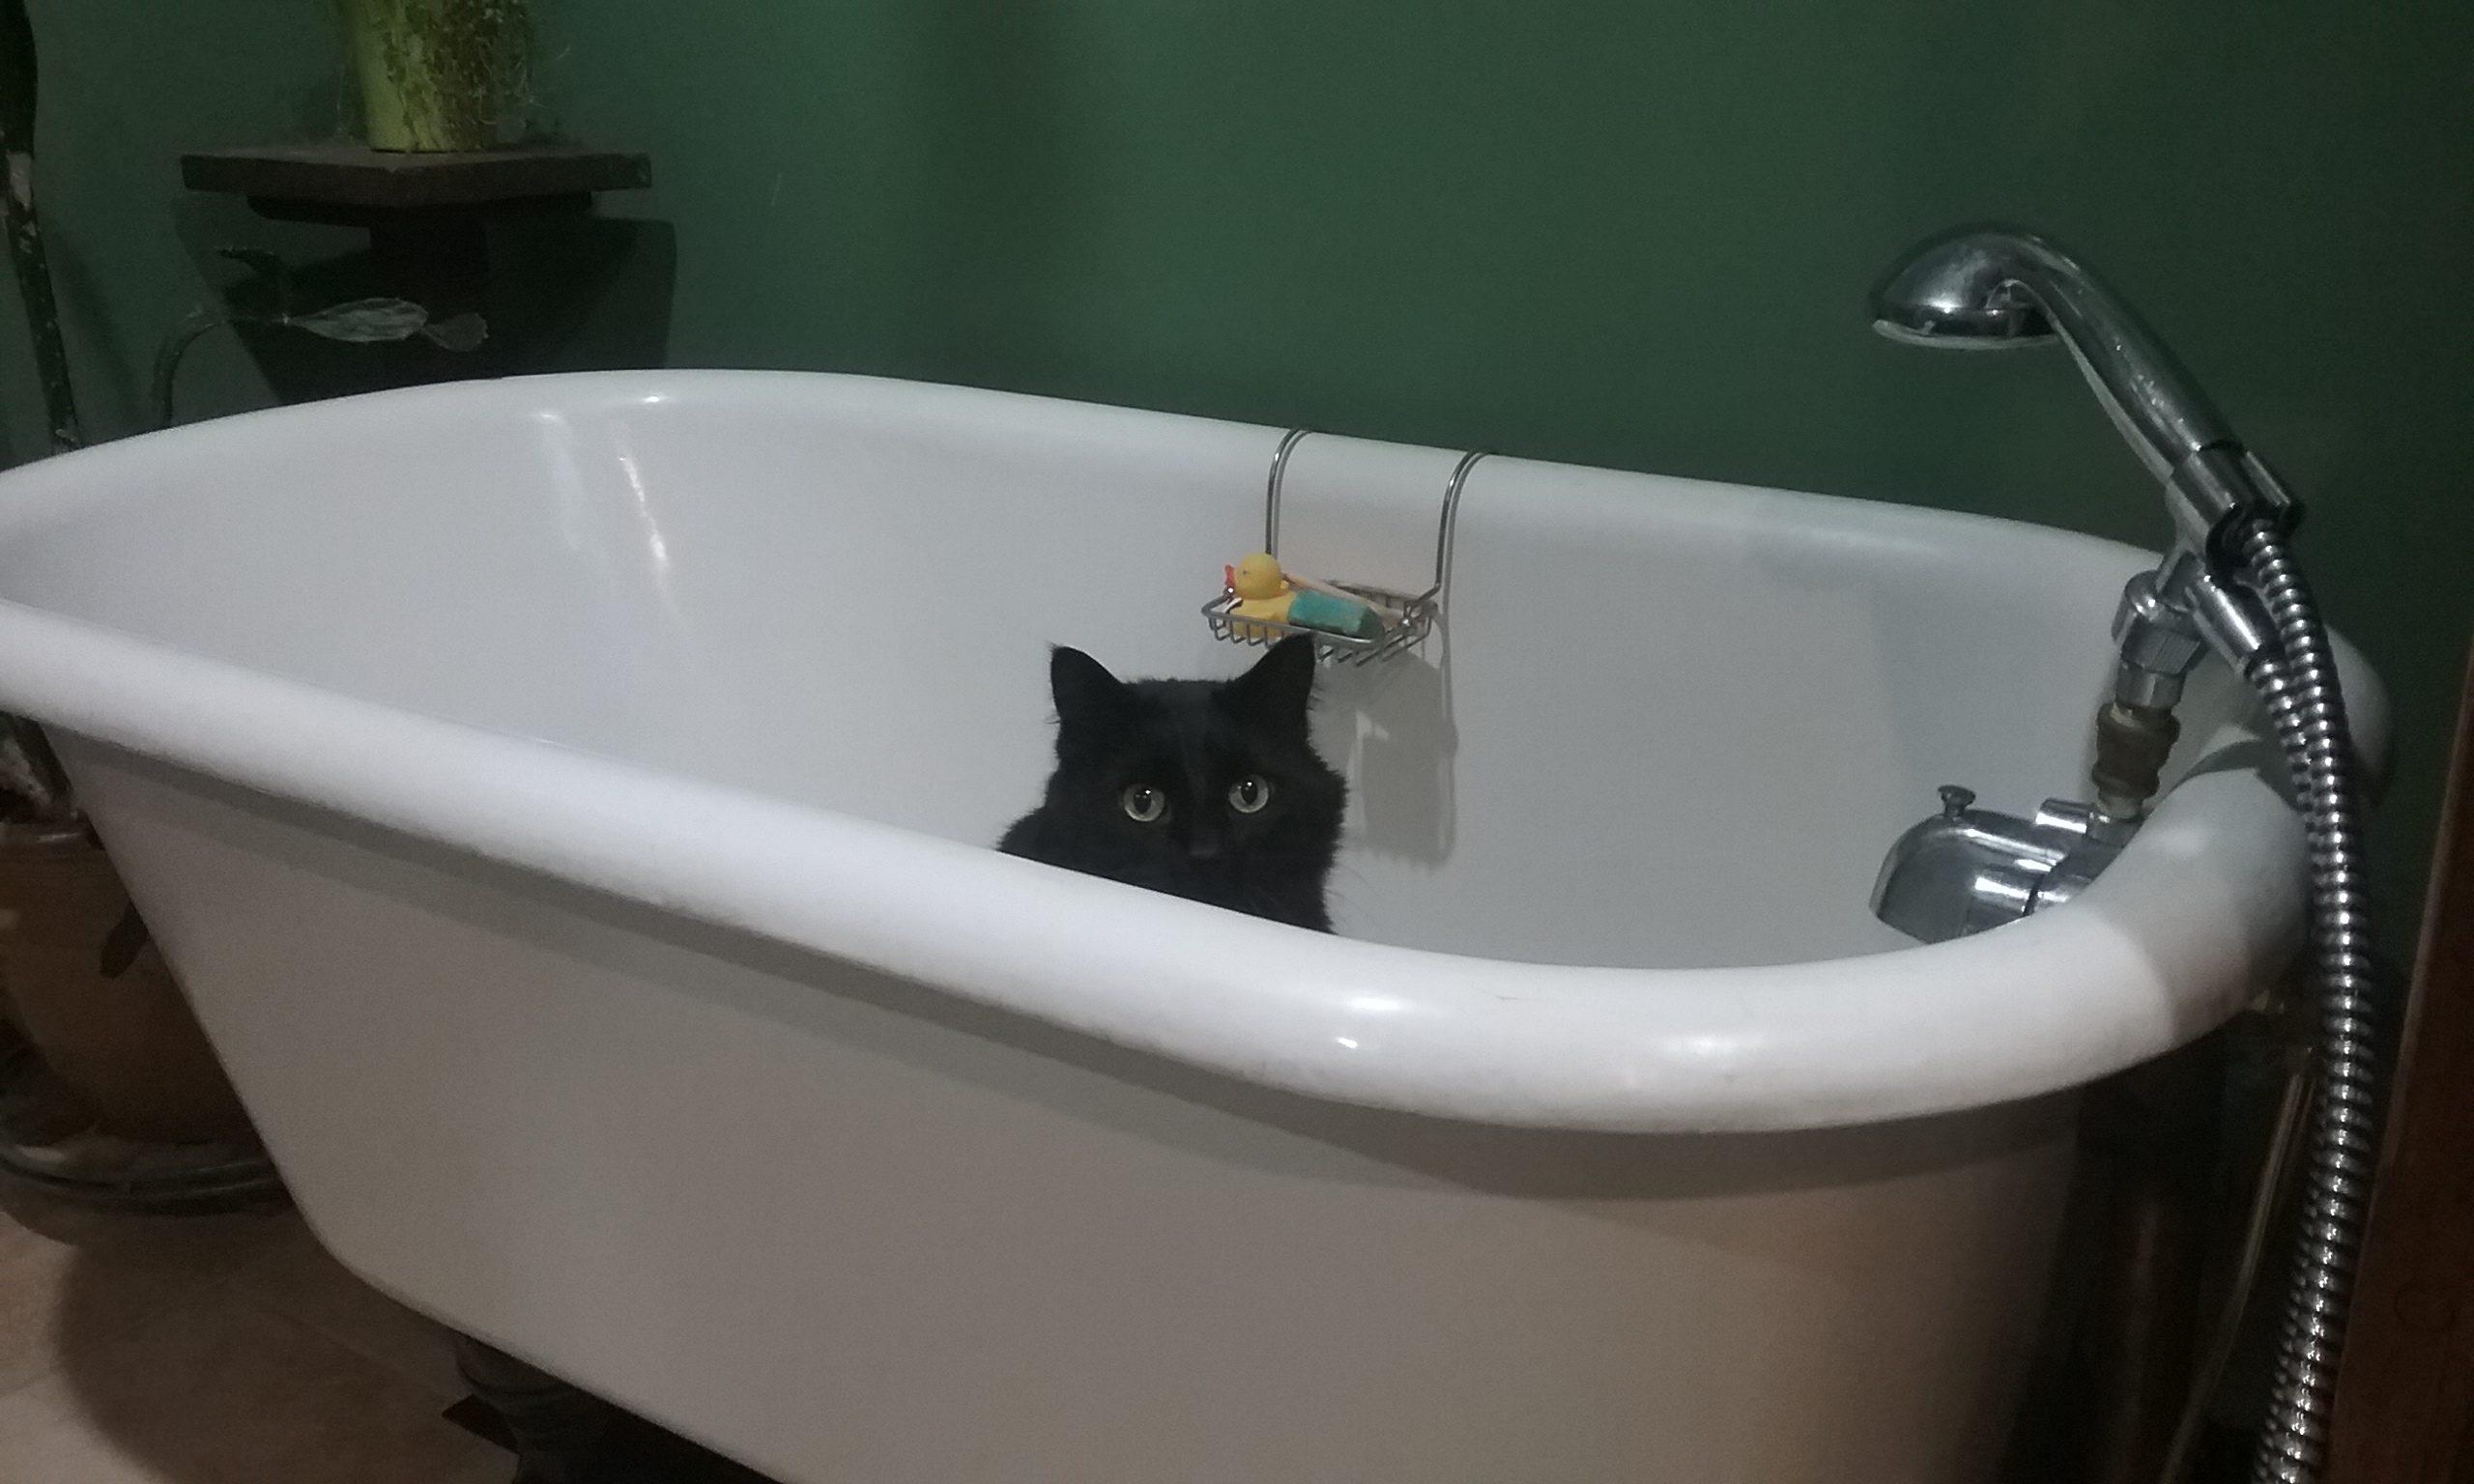 Cat Got Your Tub?